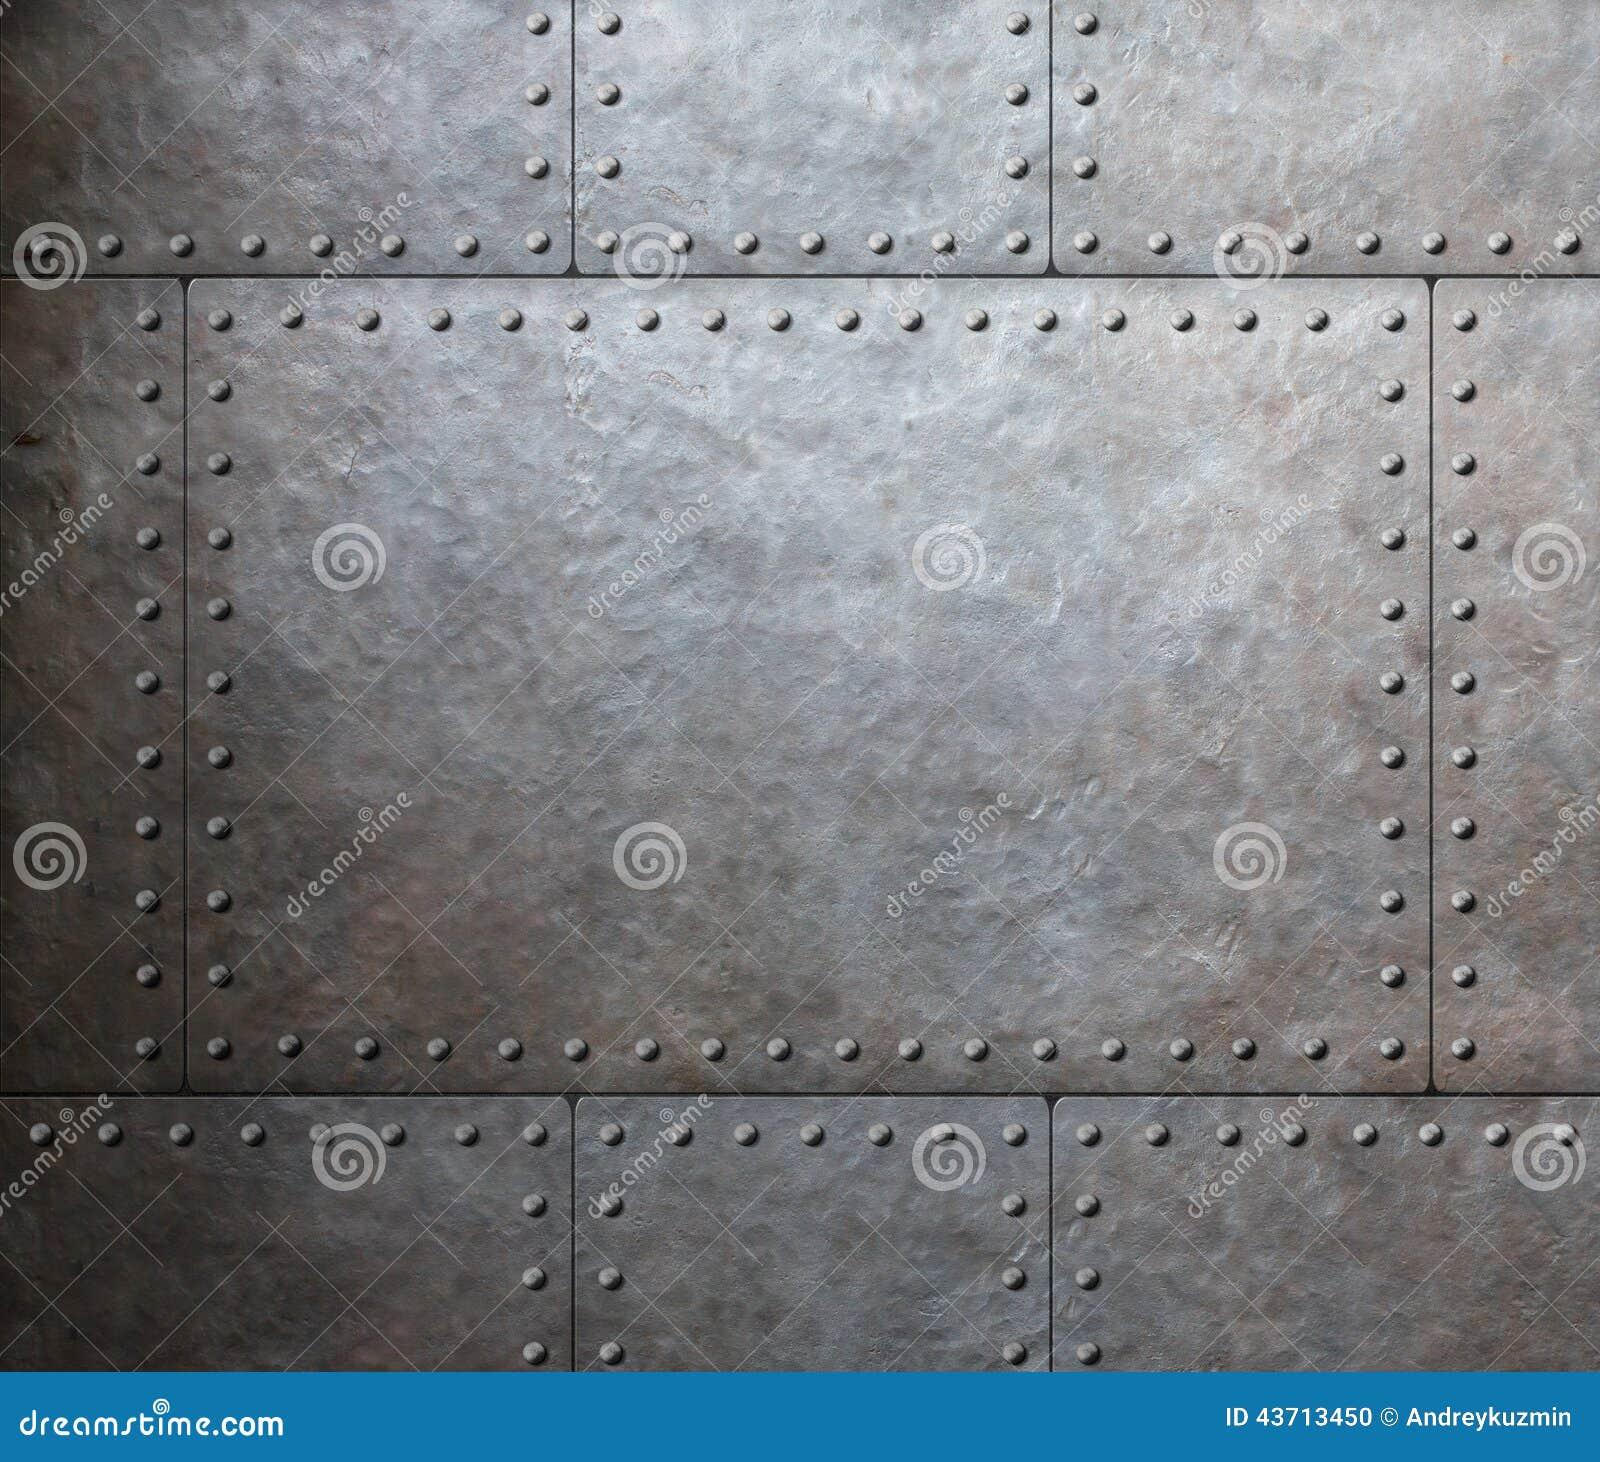 metal armor plates background stock photo